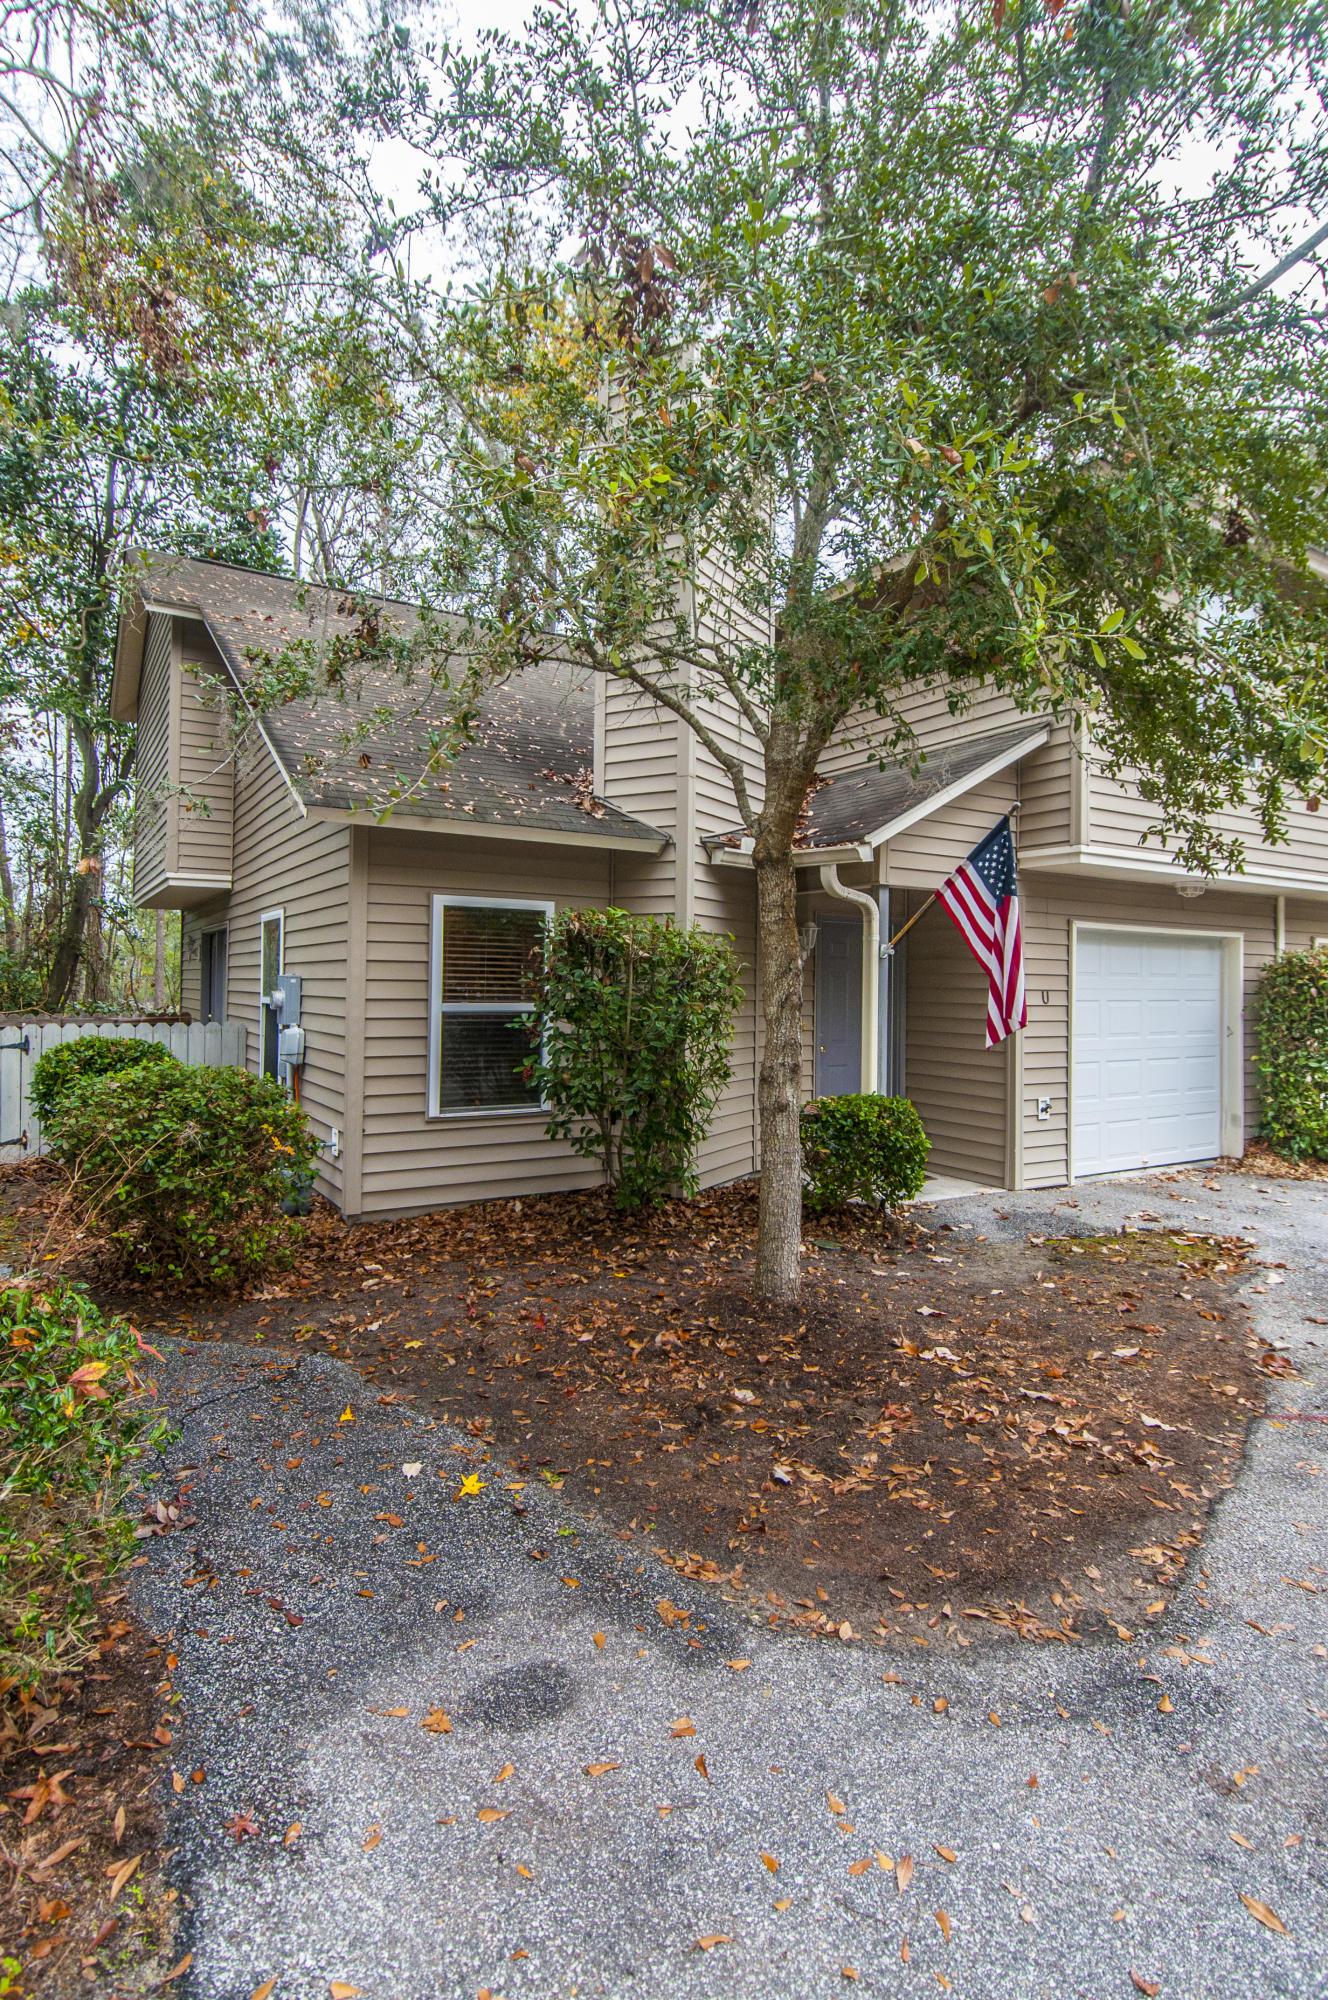 Longbranch Point Homes For Sale - 940 Estates, Charleston, SC - 23